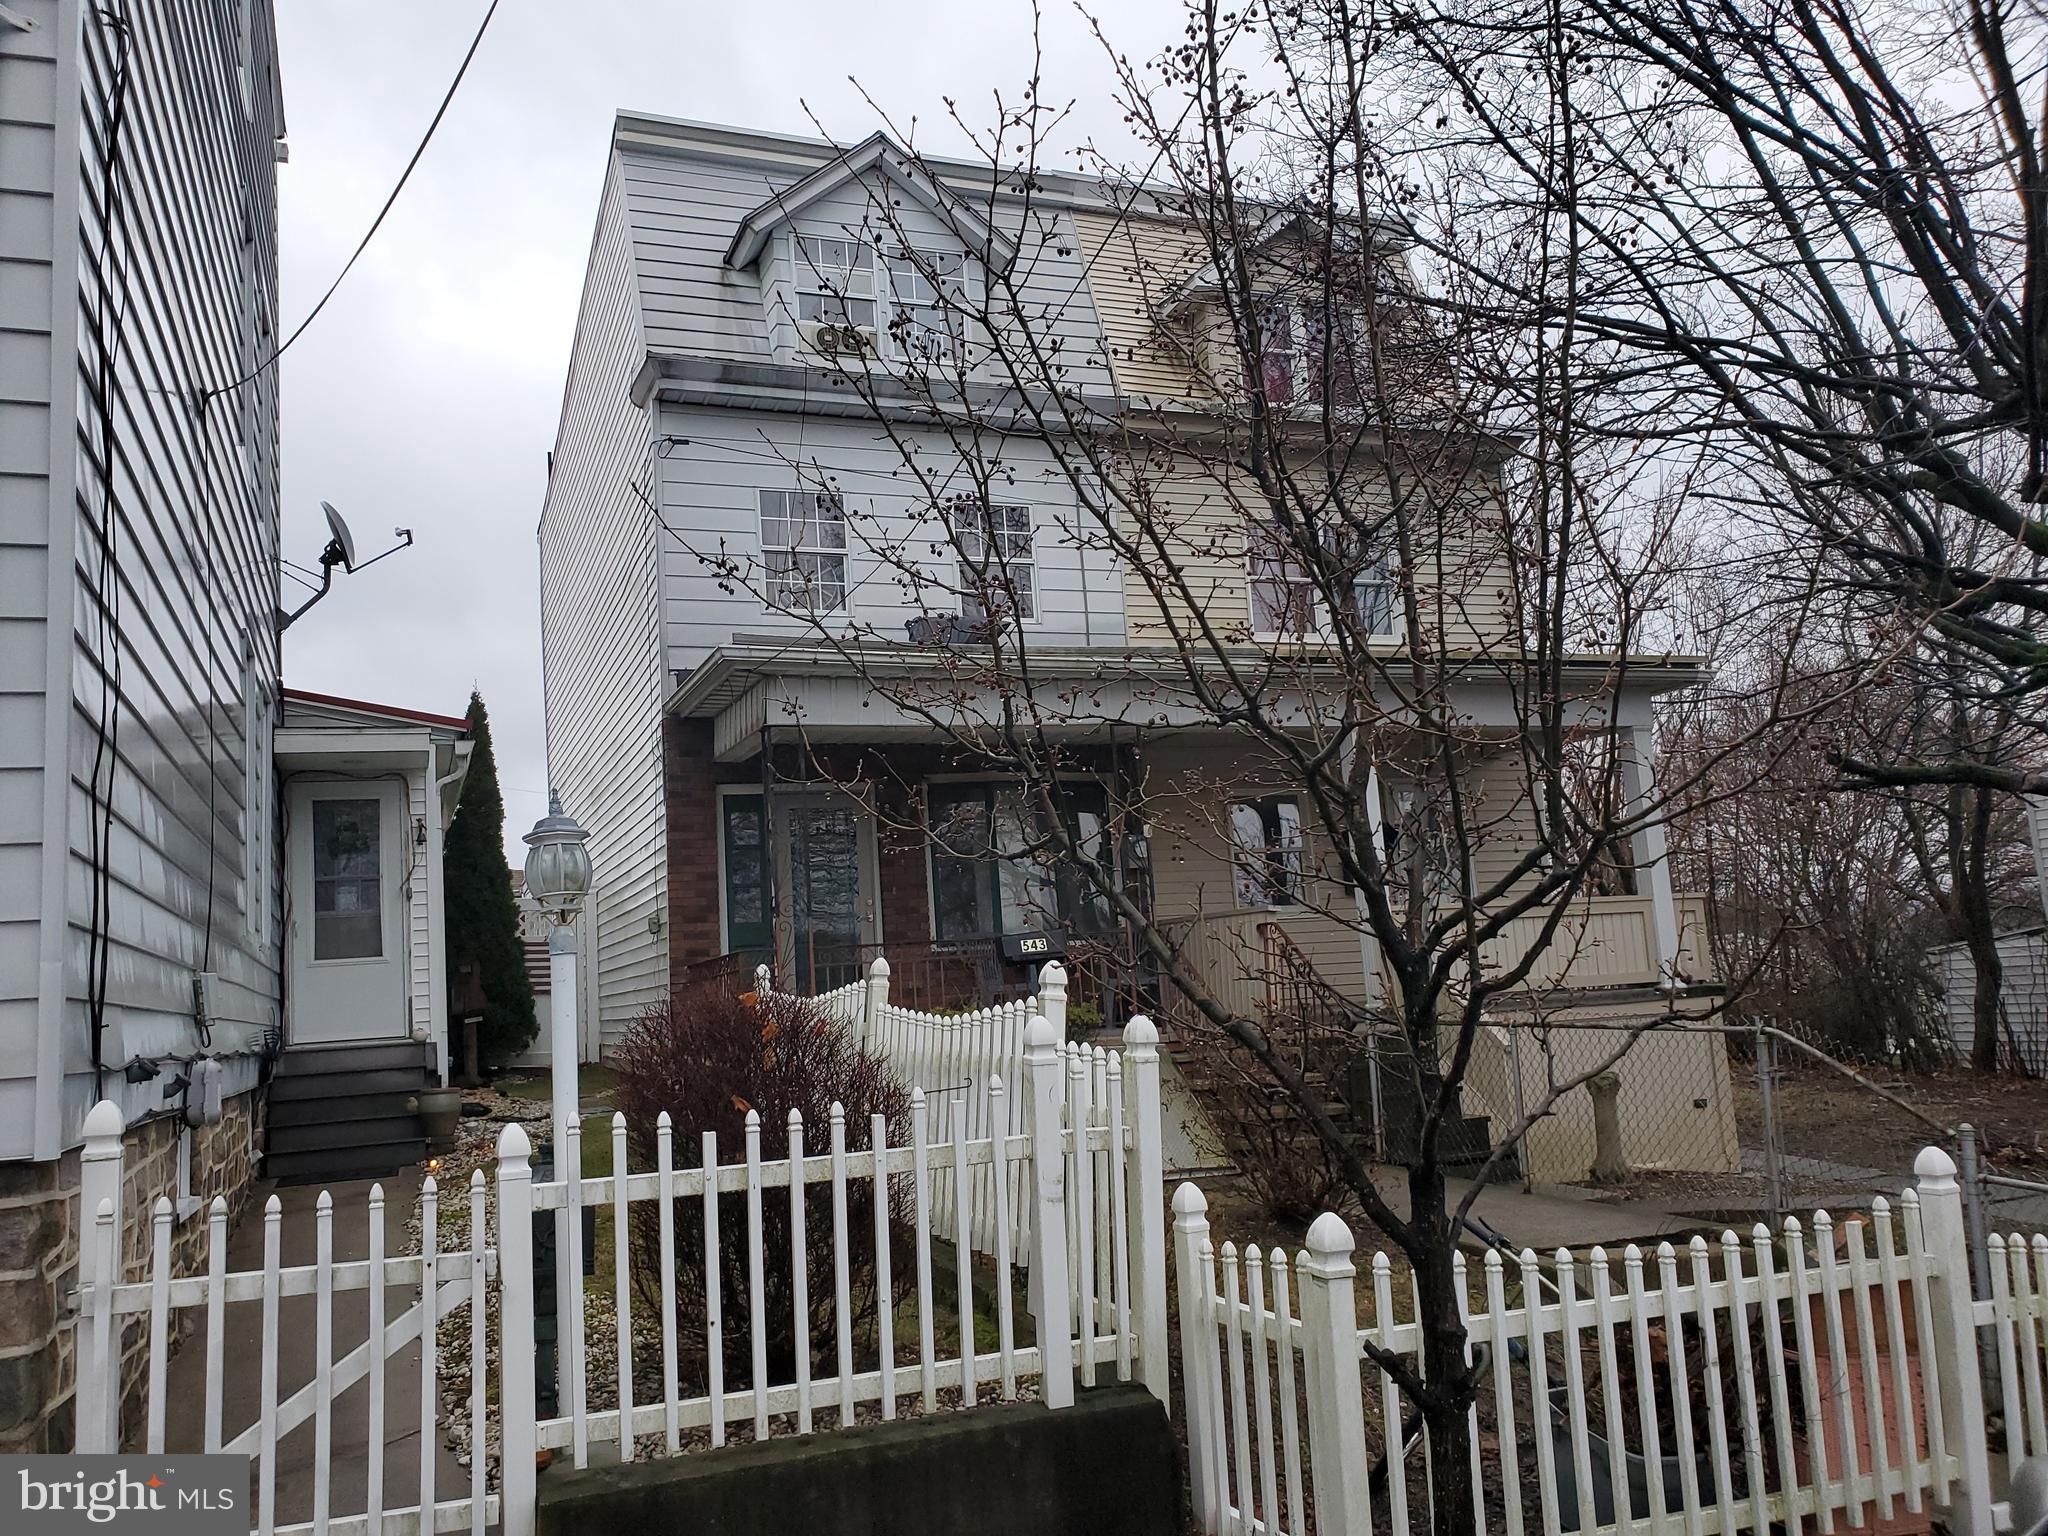 543 N 3RD STREET, MINERSVILLE, PA 17954